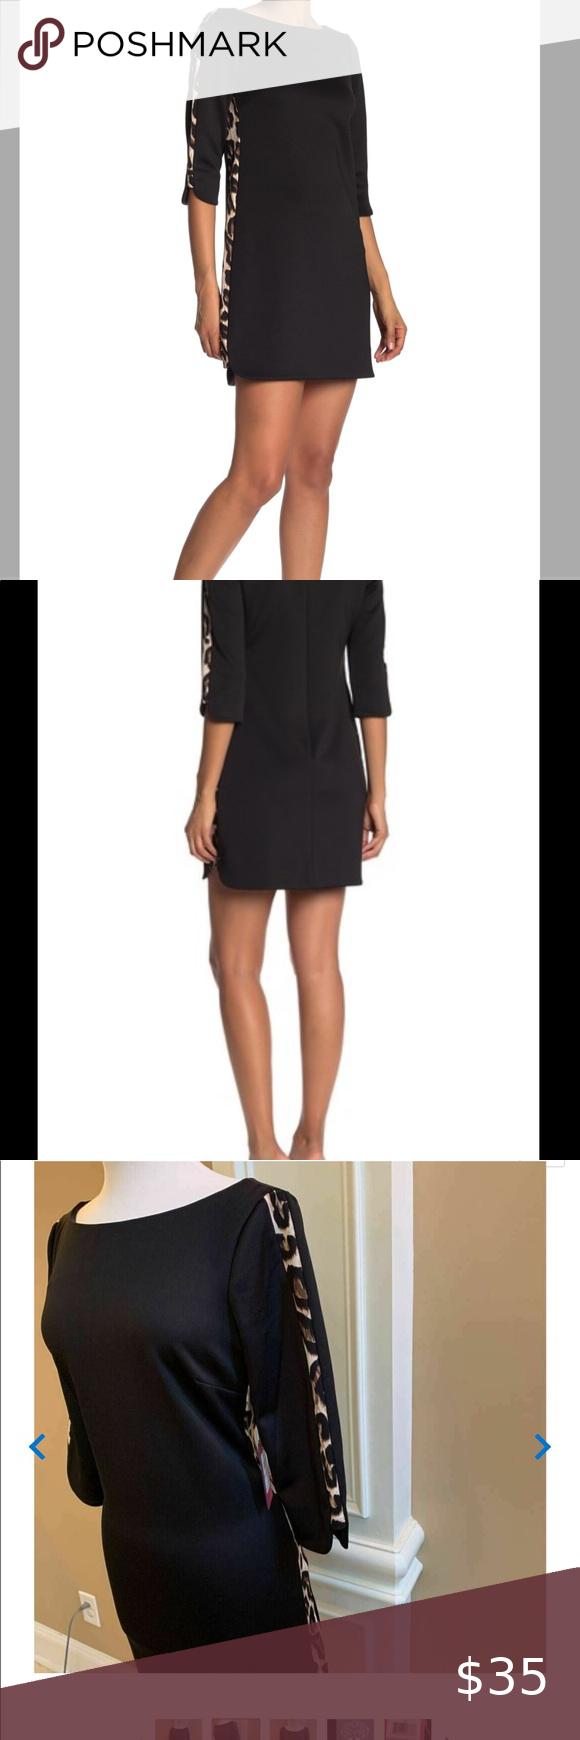 Vince Camuto Black Sheath Dress Classic Sheath Dress Black Sheath Dress Boat Neck Dress [ 1740 x 580 Pixel ]